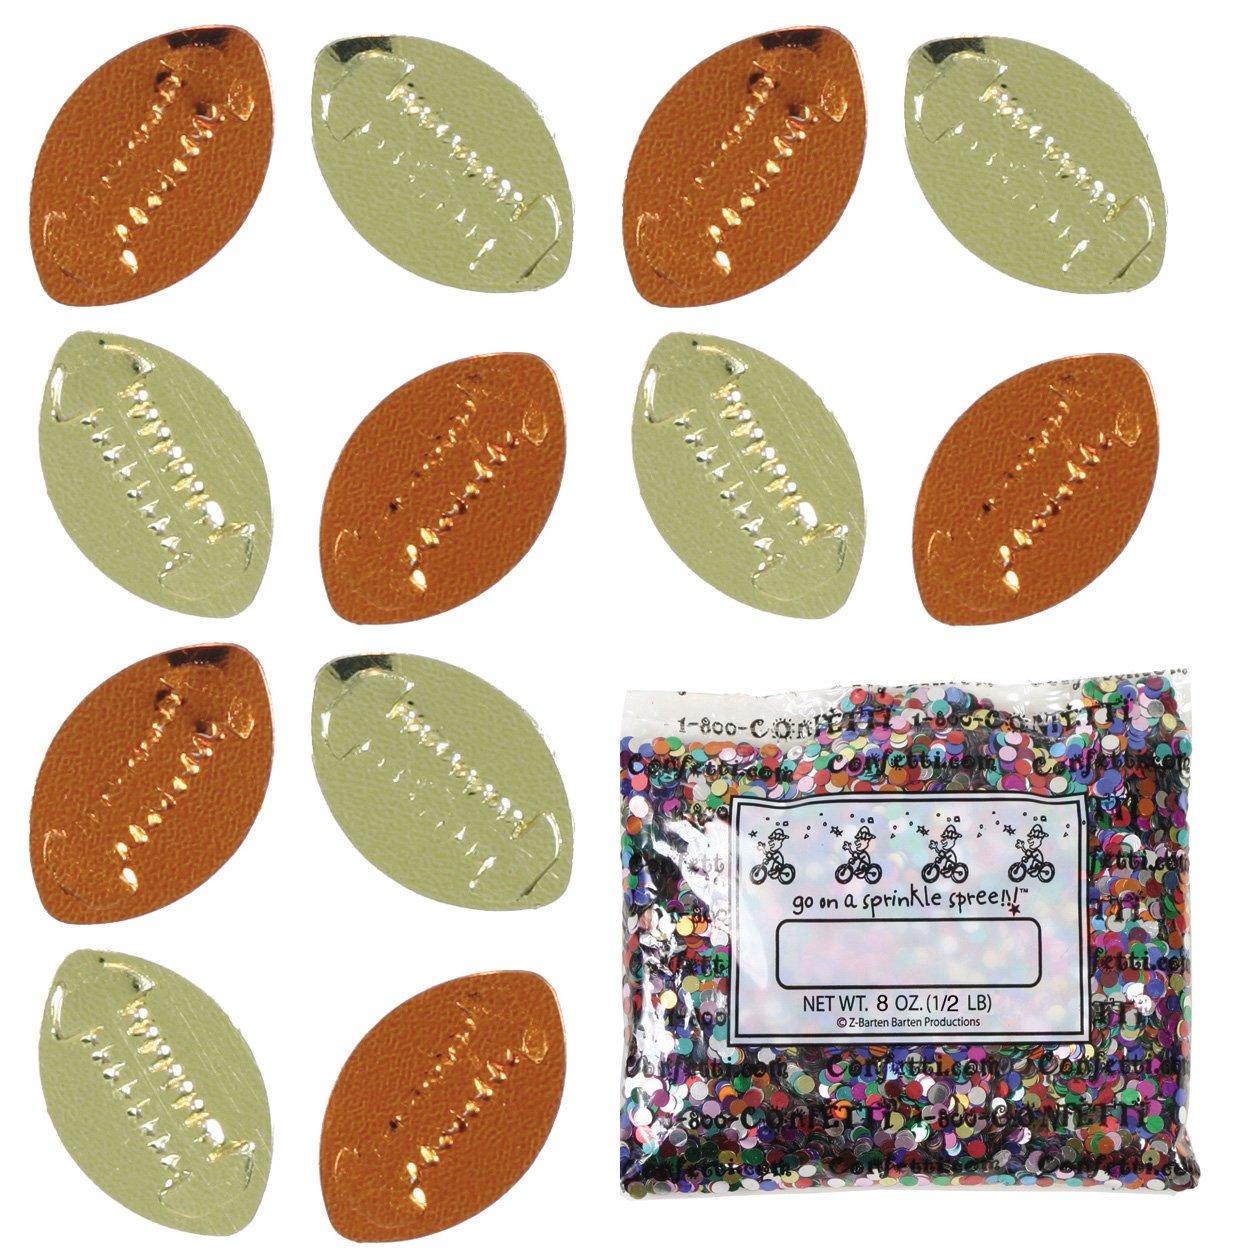 Confetti Football Gold, Orange Mix - Half Pound Bag (8 oz) FREE SHIPPING --- (CCP9540) by Jimmy Jems (Image #1)